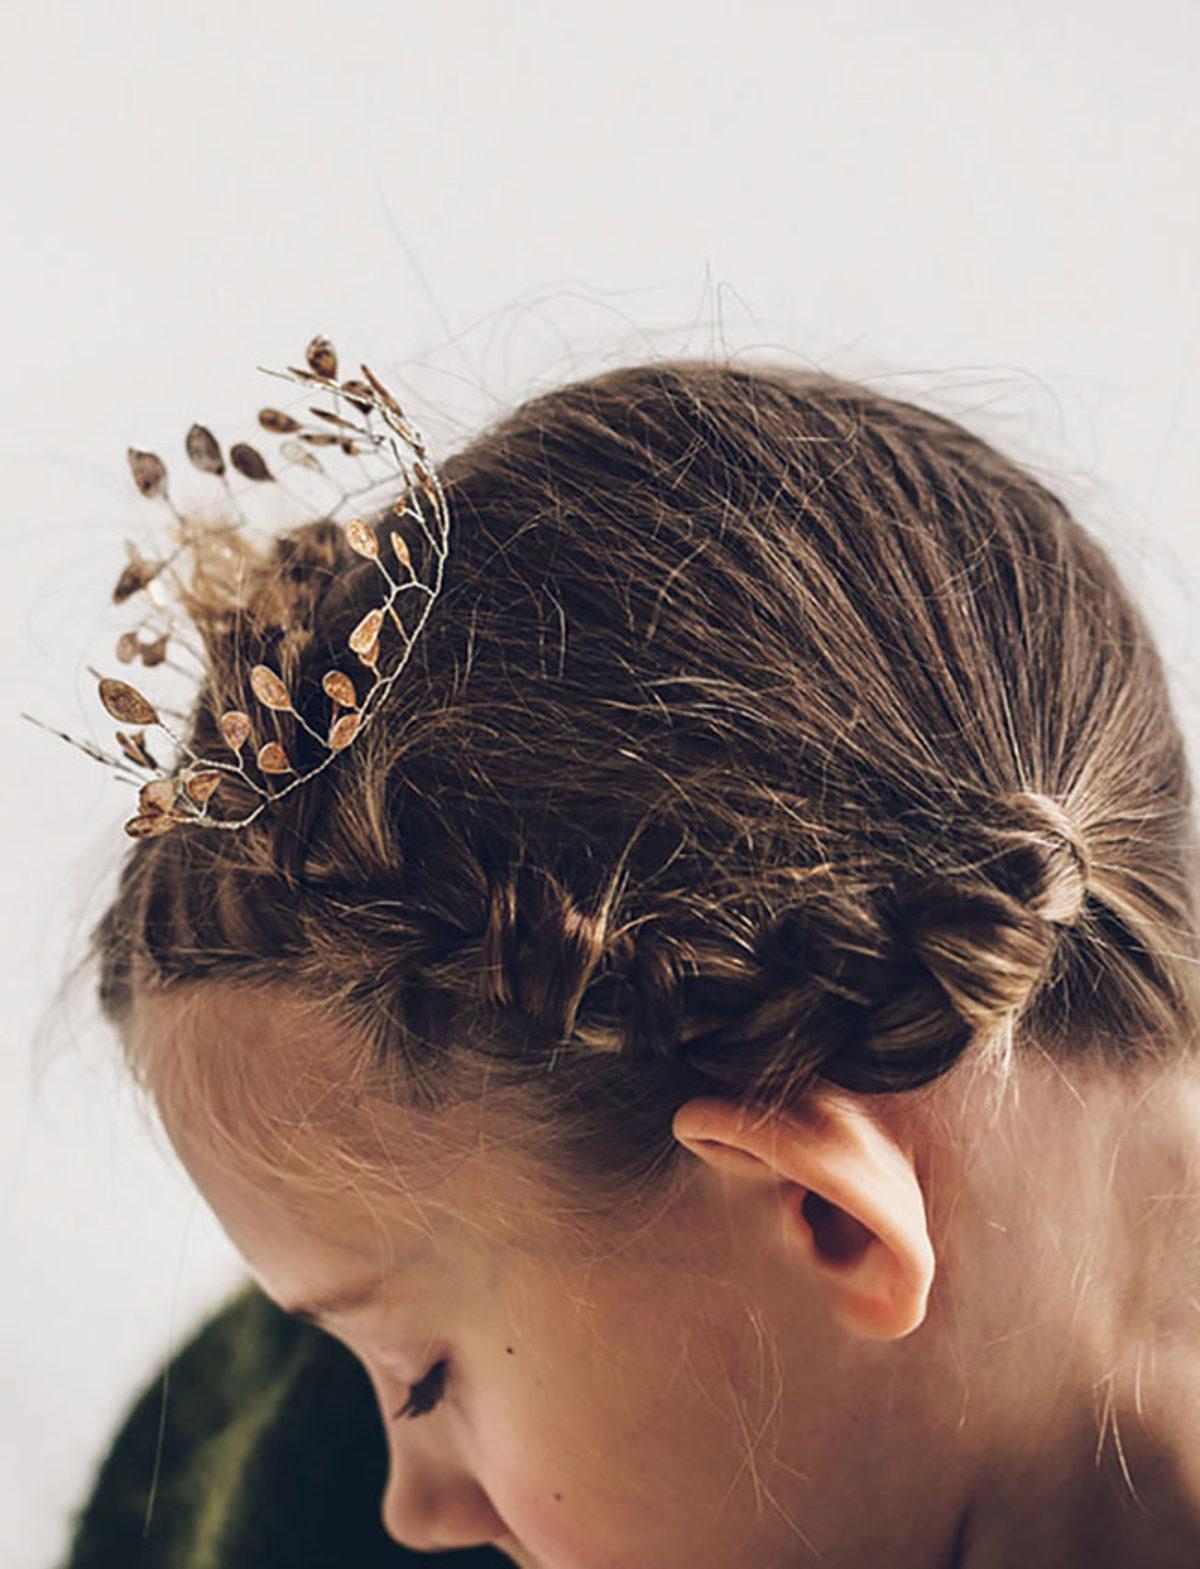 Bijoux-crochetes-fil-metallique-couronne